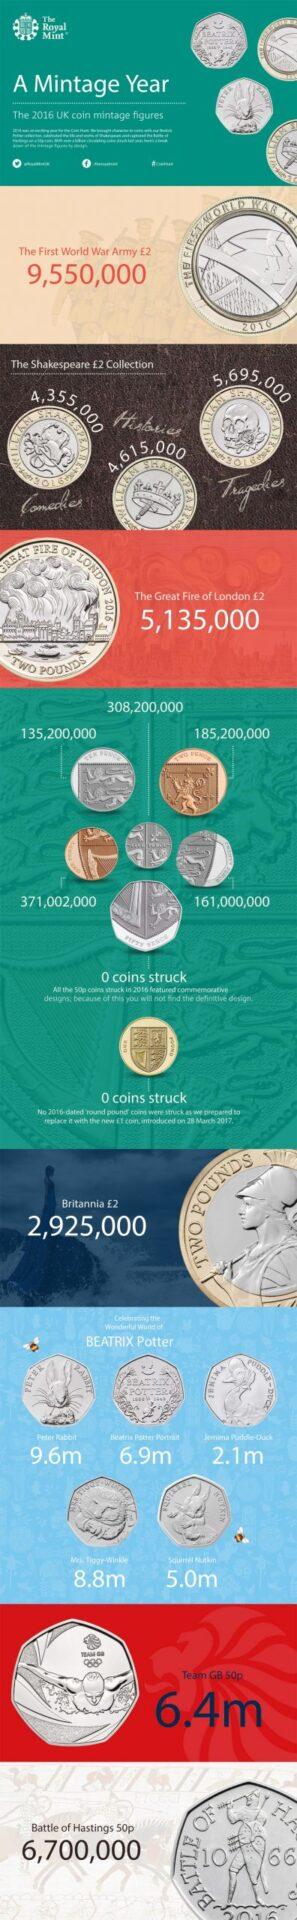 British Coins 2016 Mintage Figures